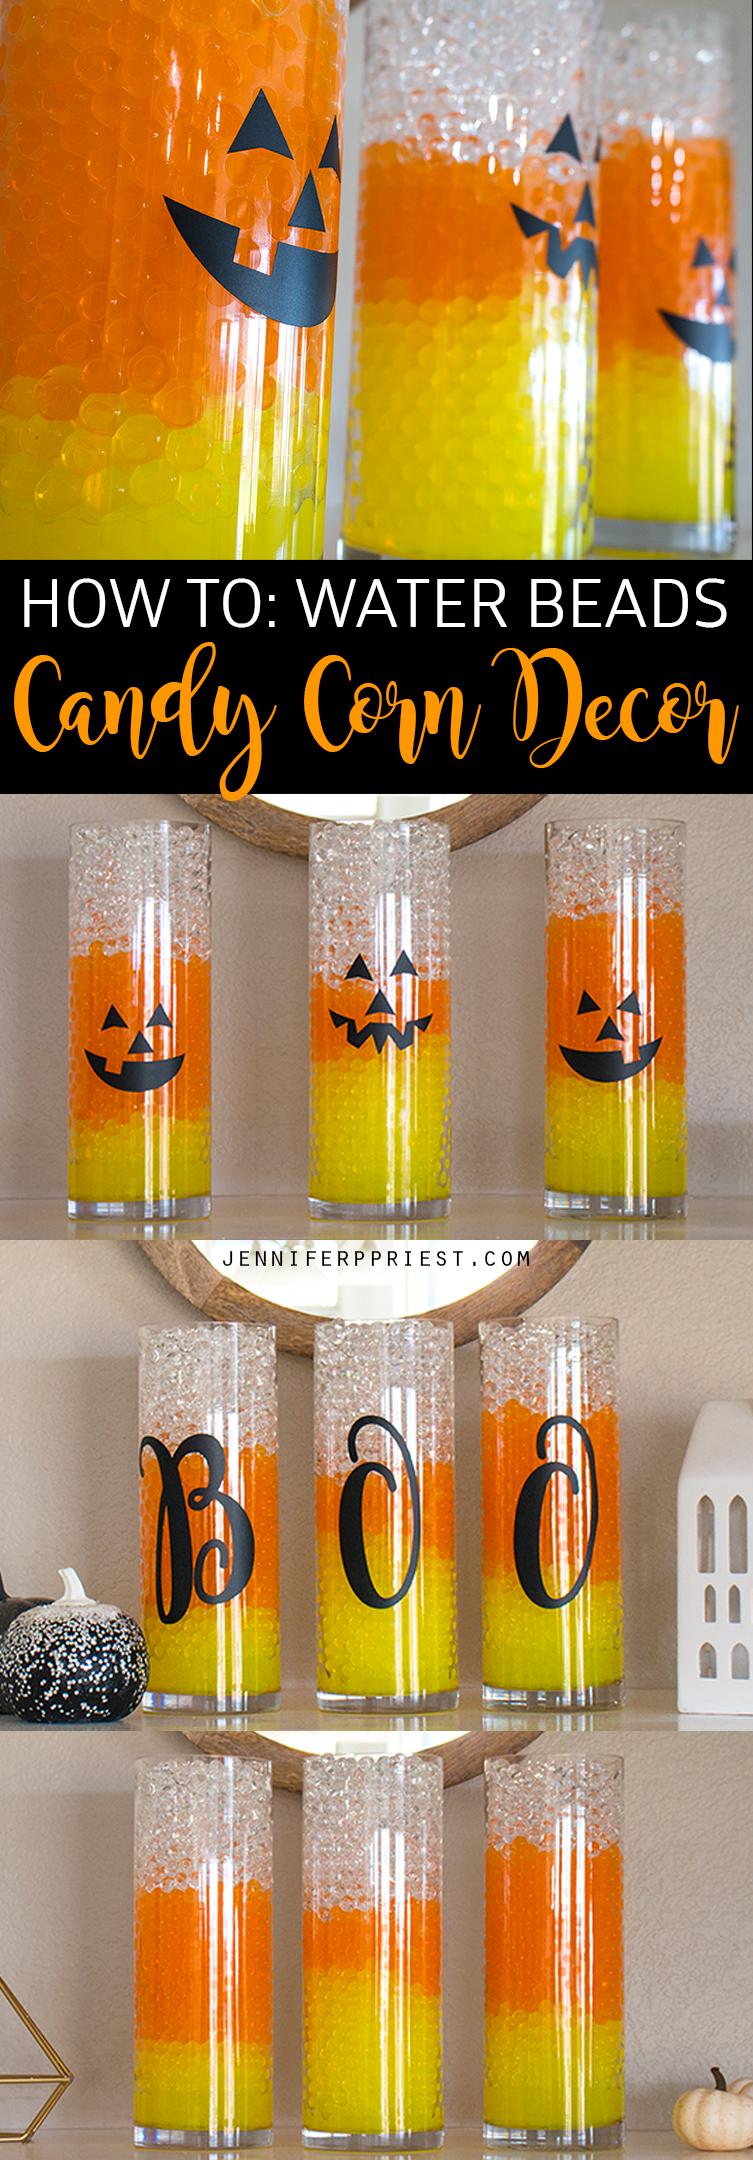 Candy Corn Water Beads Halloween Vase Filler Idea